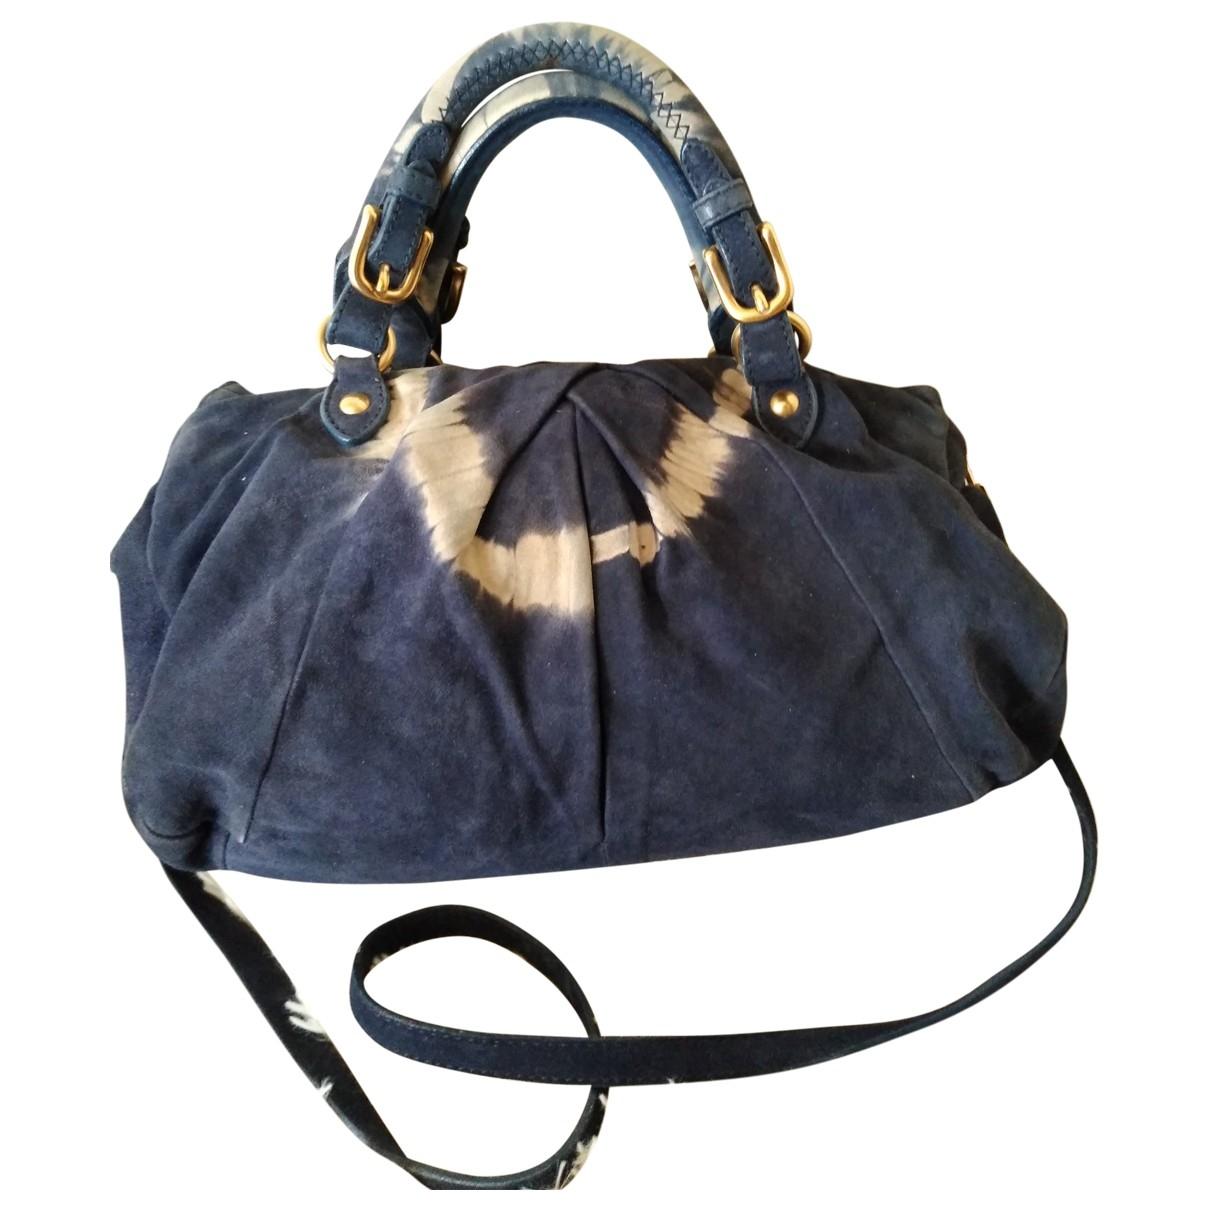 Miu Miu \N Handtasche in  Blau Leinen